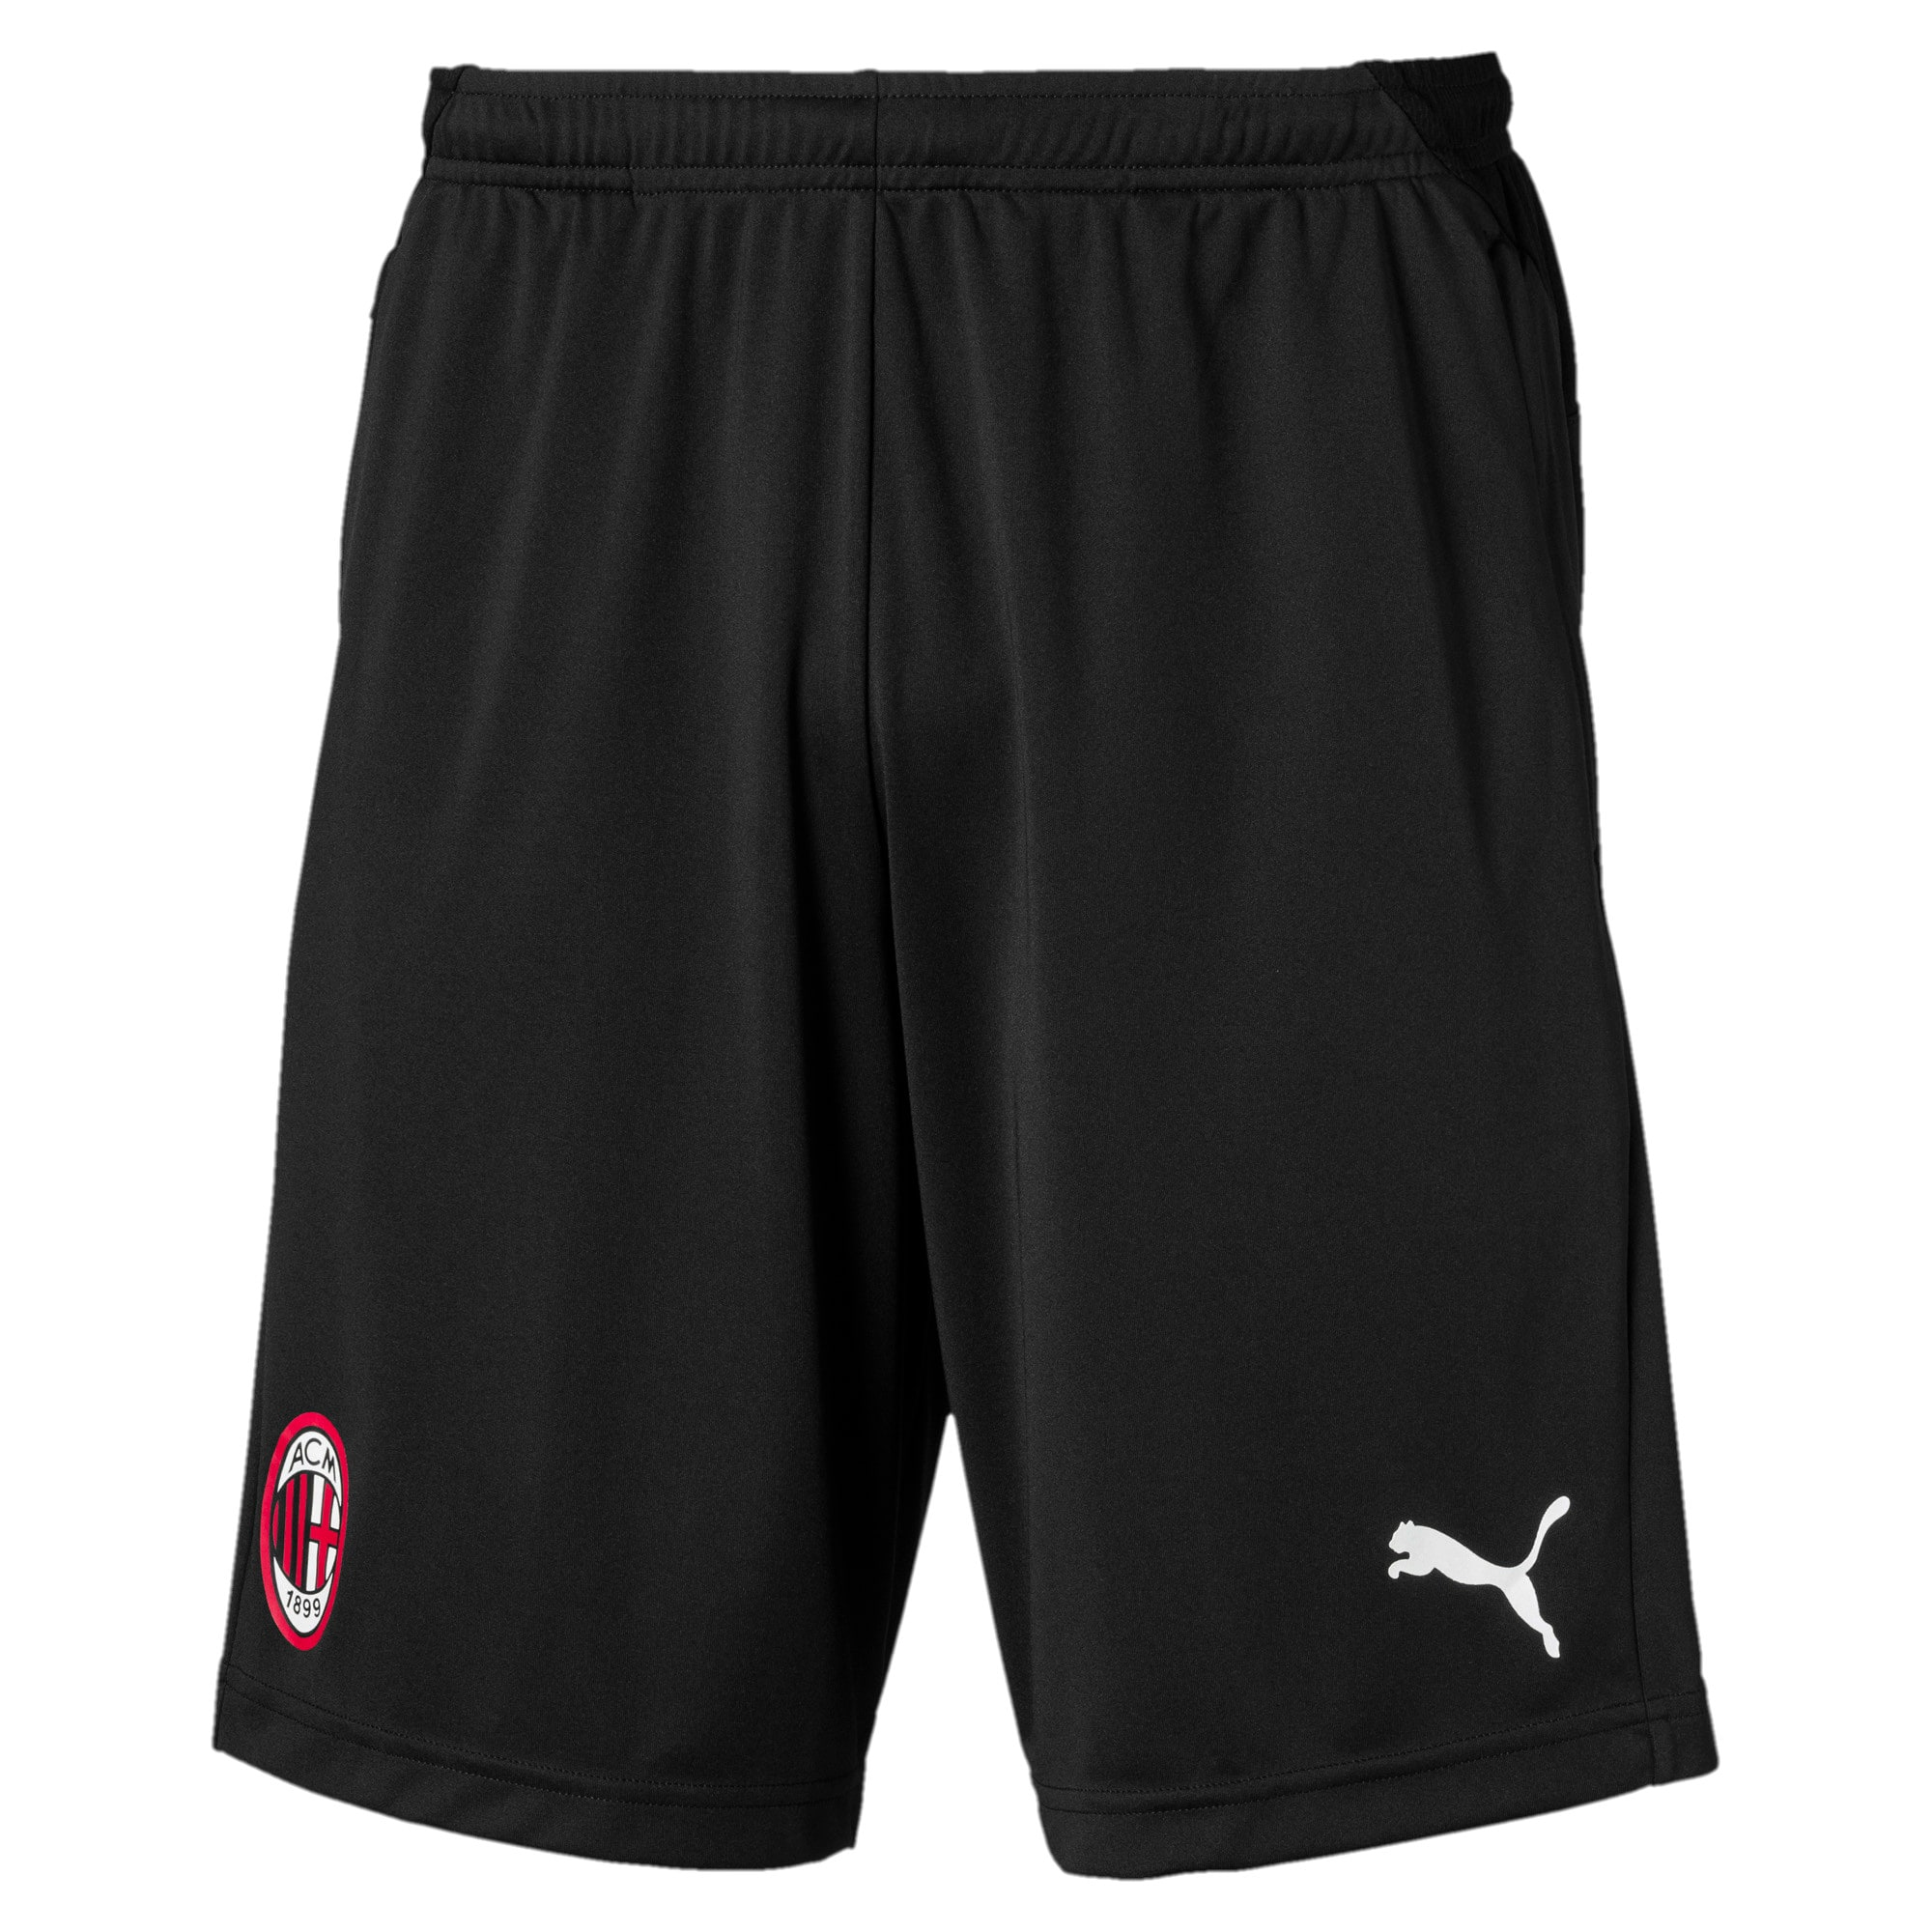 Thumbnail 4 of AC Milan Men's Training Shorts, Puma Black, medium